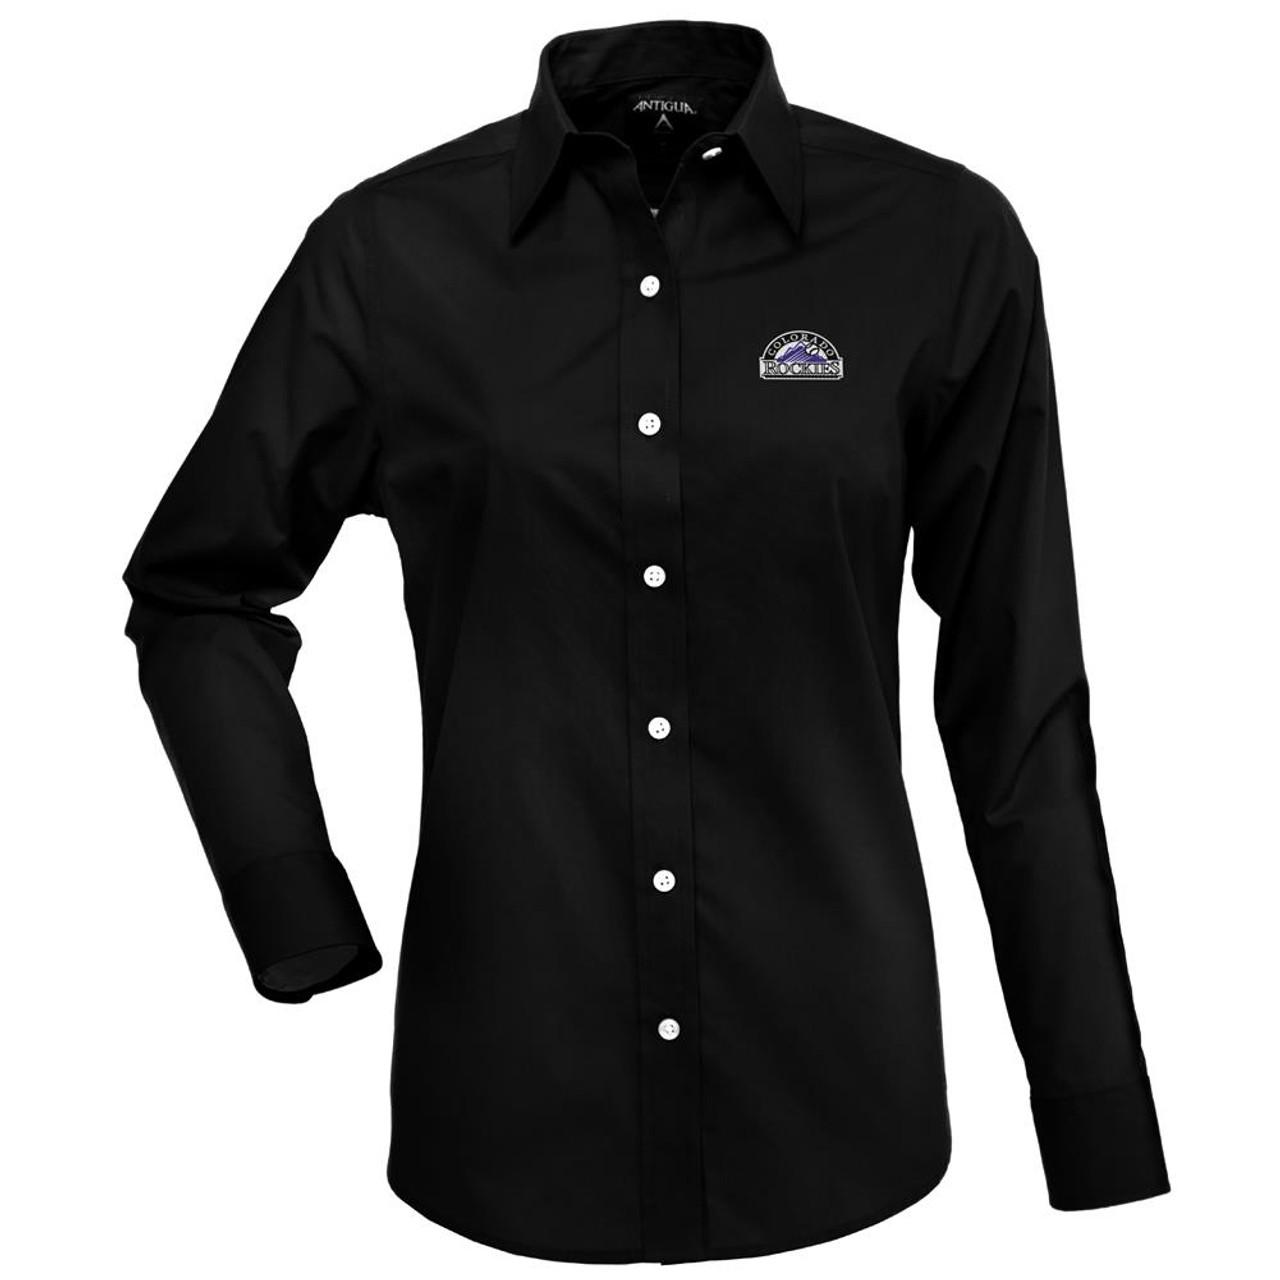 Colorado Rockies Women's Long Sleeve Dress Shirt